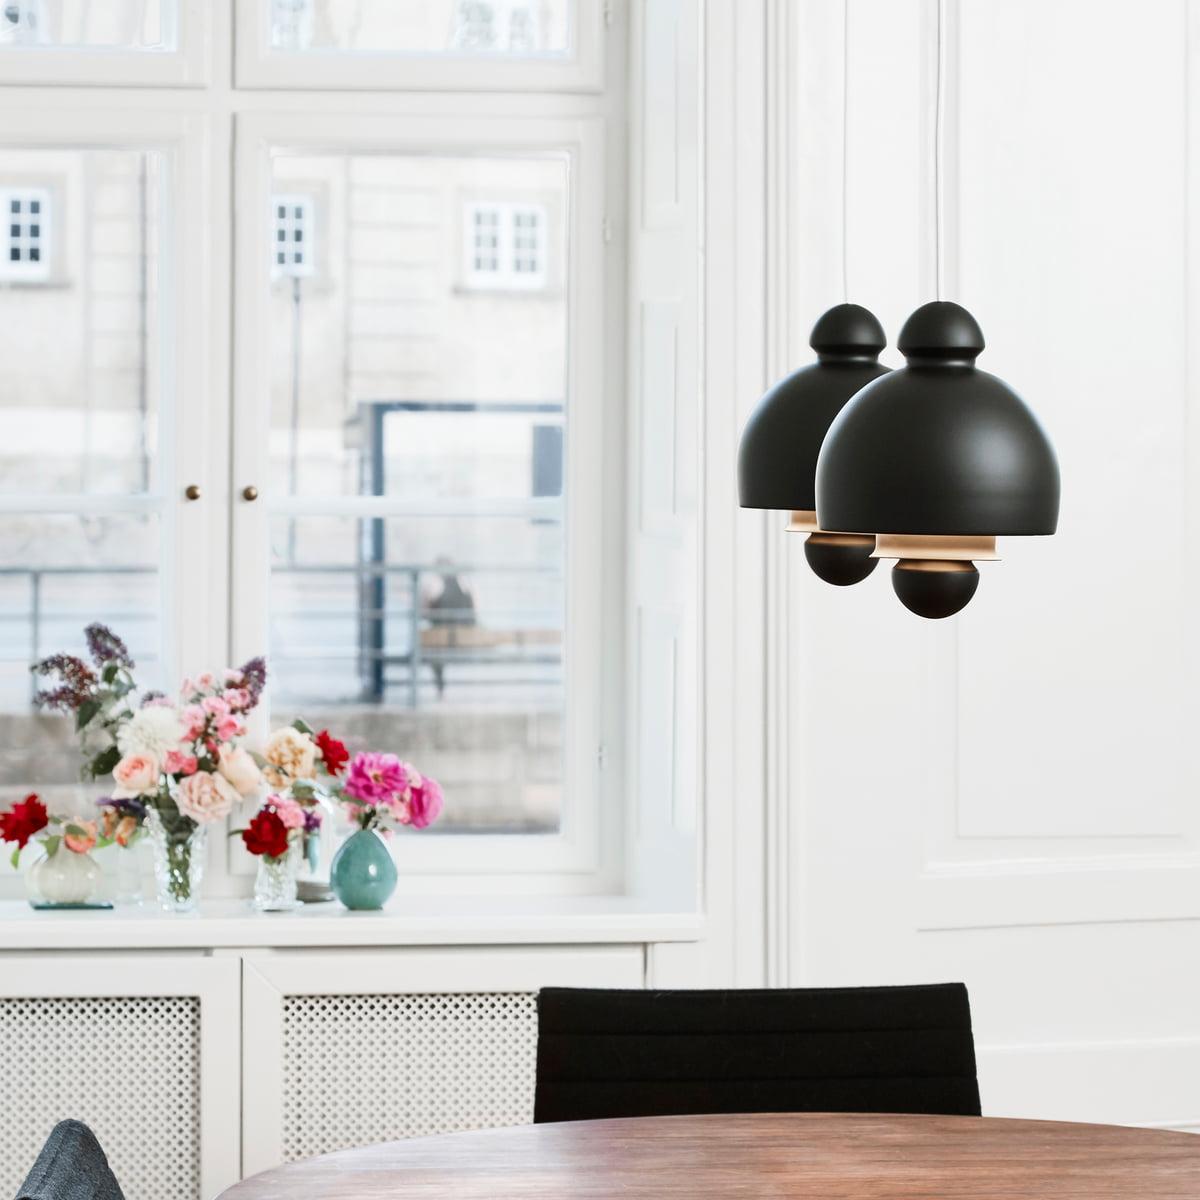 Antoni Pendant Lamp By Le Klint In Royal Black